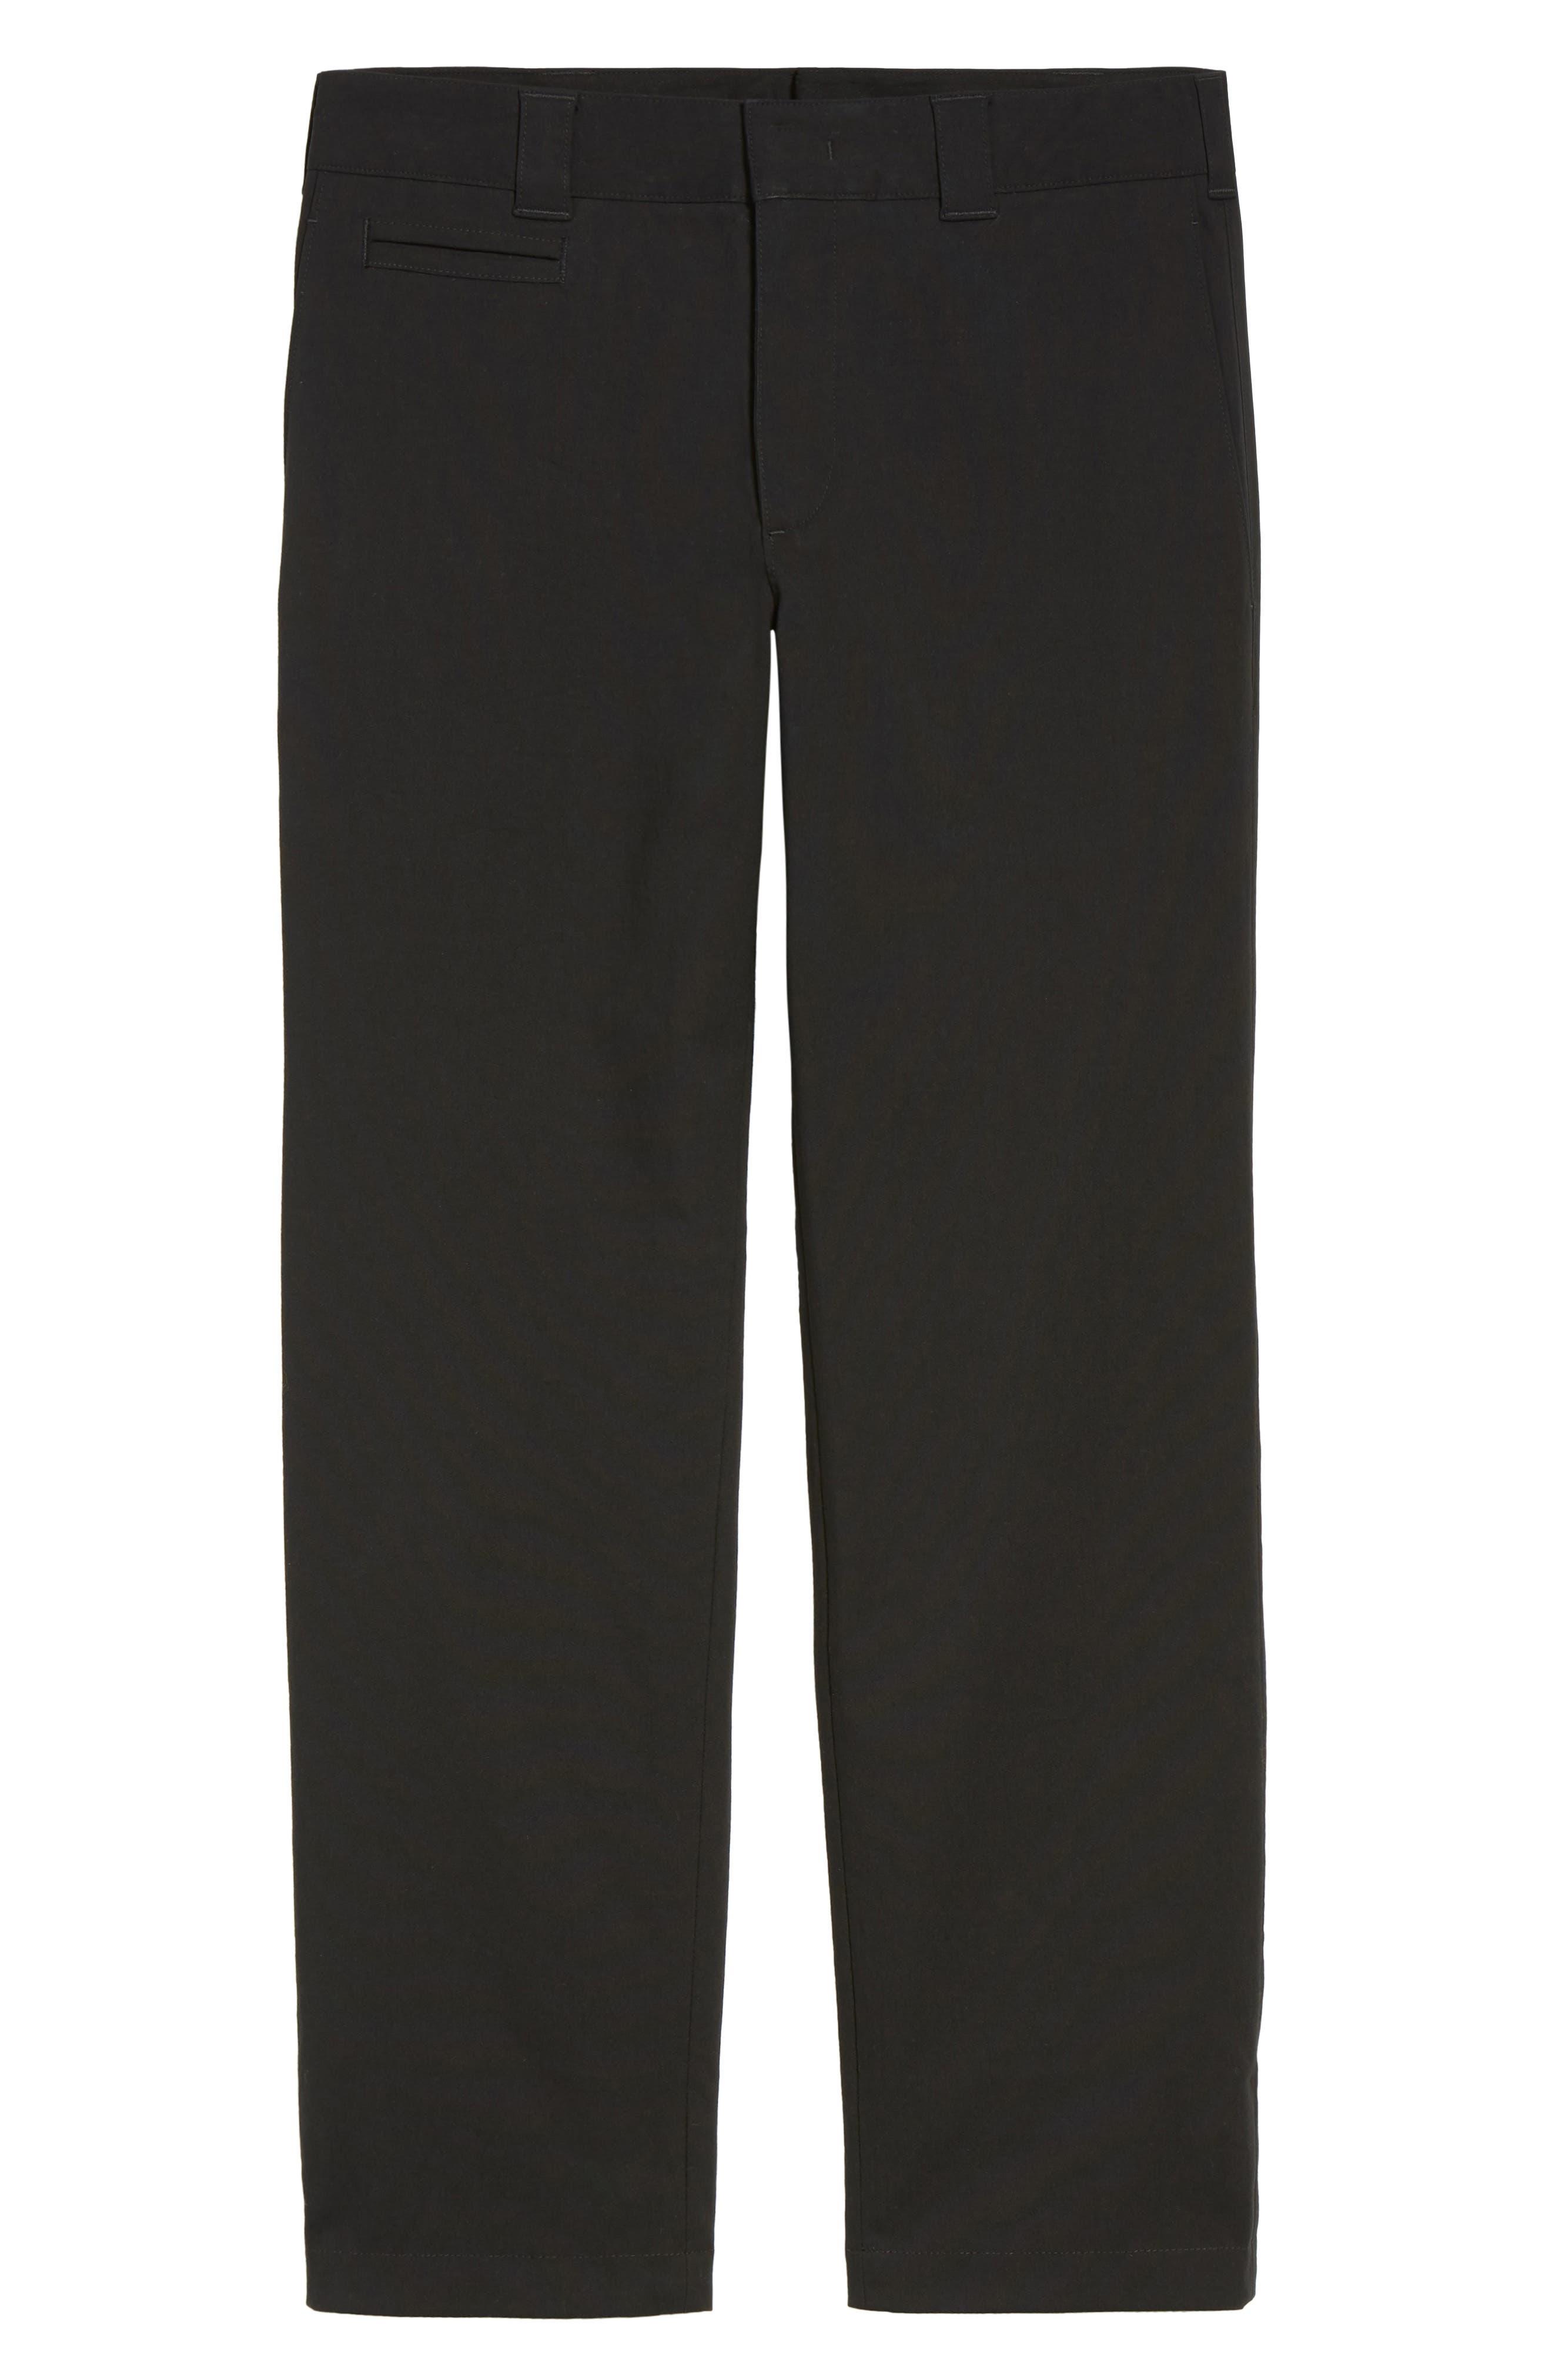 Utility Modern Straight Leg Pants,                             Alternate thumbnail 6, color,                             Black